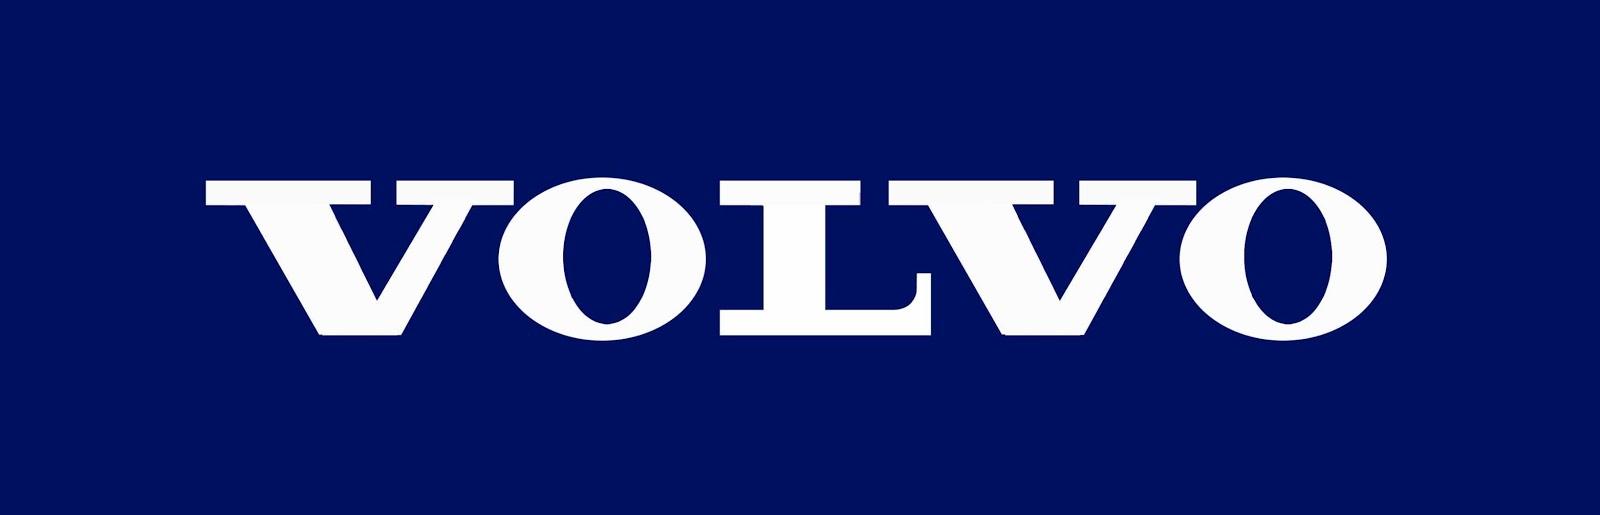 2013 Geneva Motor Show Volvo Logo